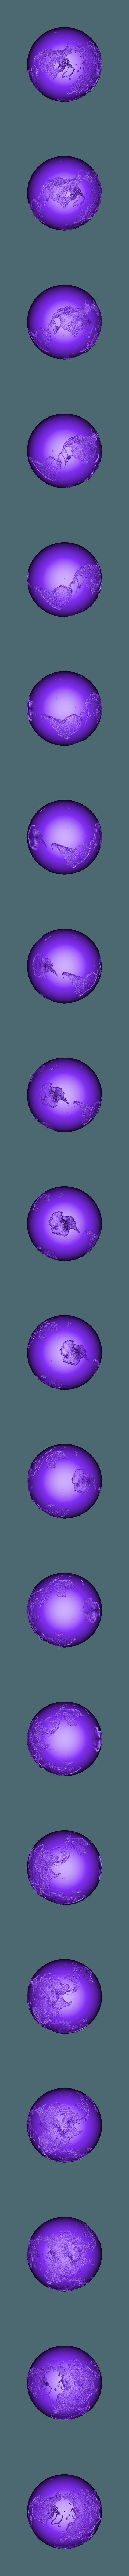 12cm_more_contrast.STL Download free STL file Spherical Lithophane - World Map 12cm remix • 3D printable object, Domi1988